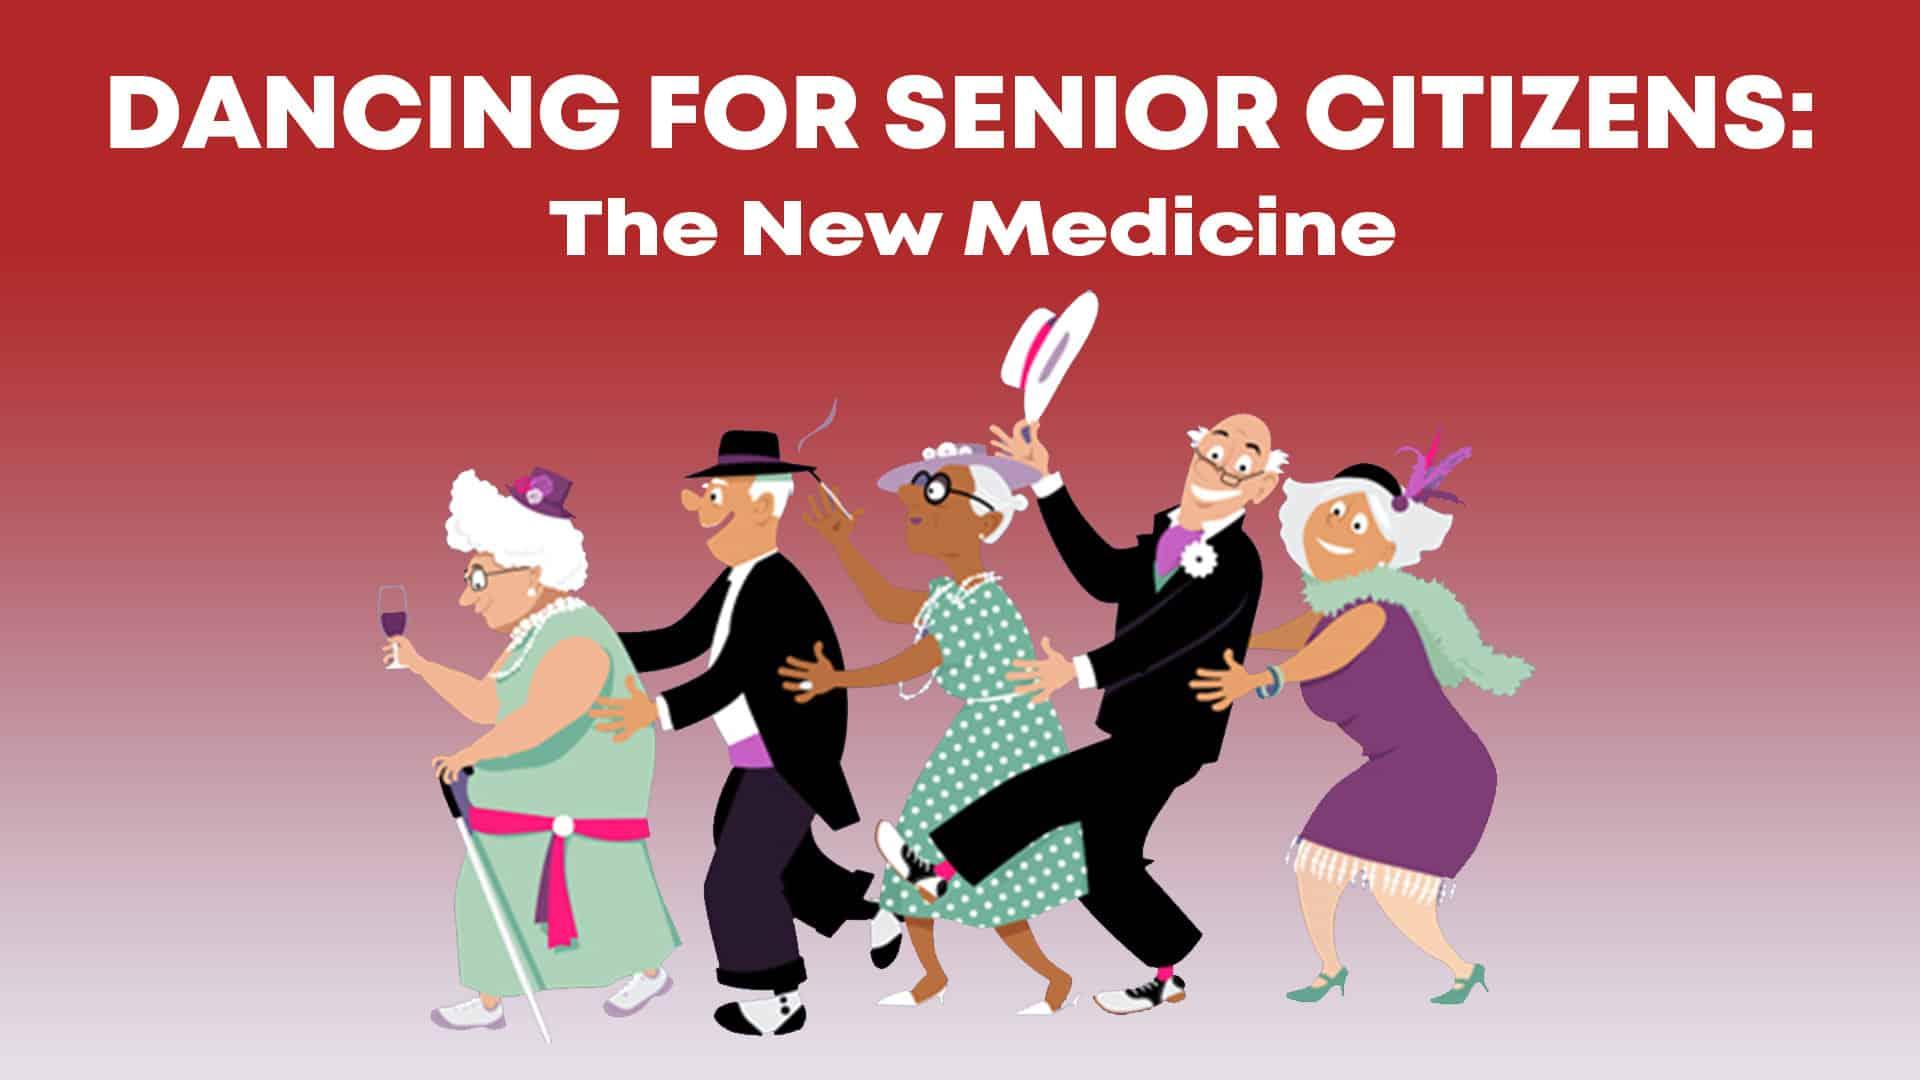 Dancing for senior citizens, new medicine, dance for senior citizens, dance as a medicine, dance classes, online dance classes, dance classes for adults, dance for beginners